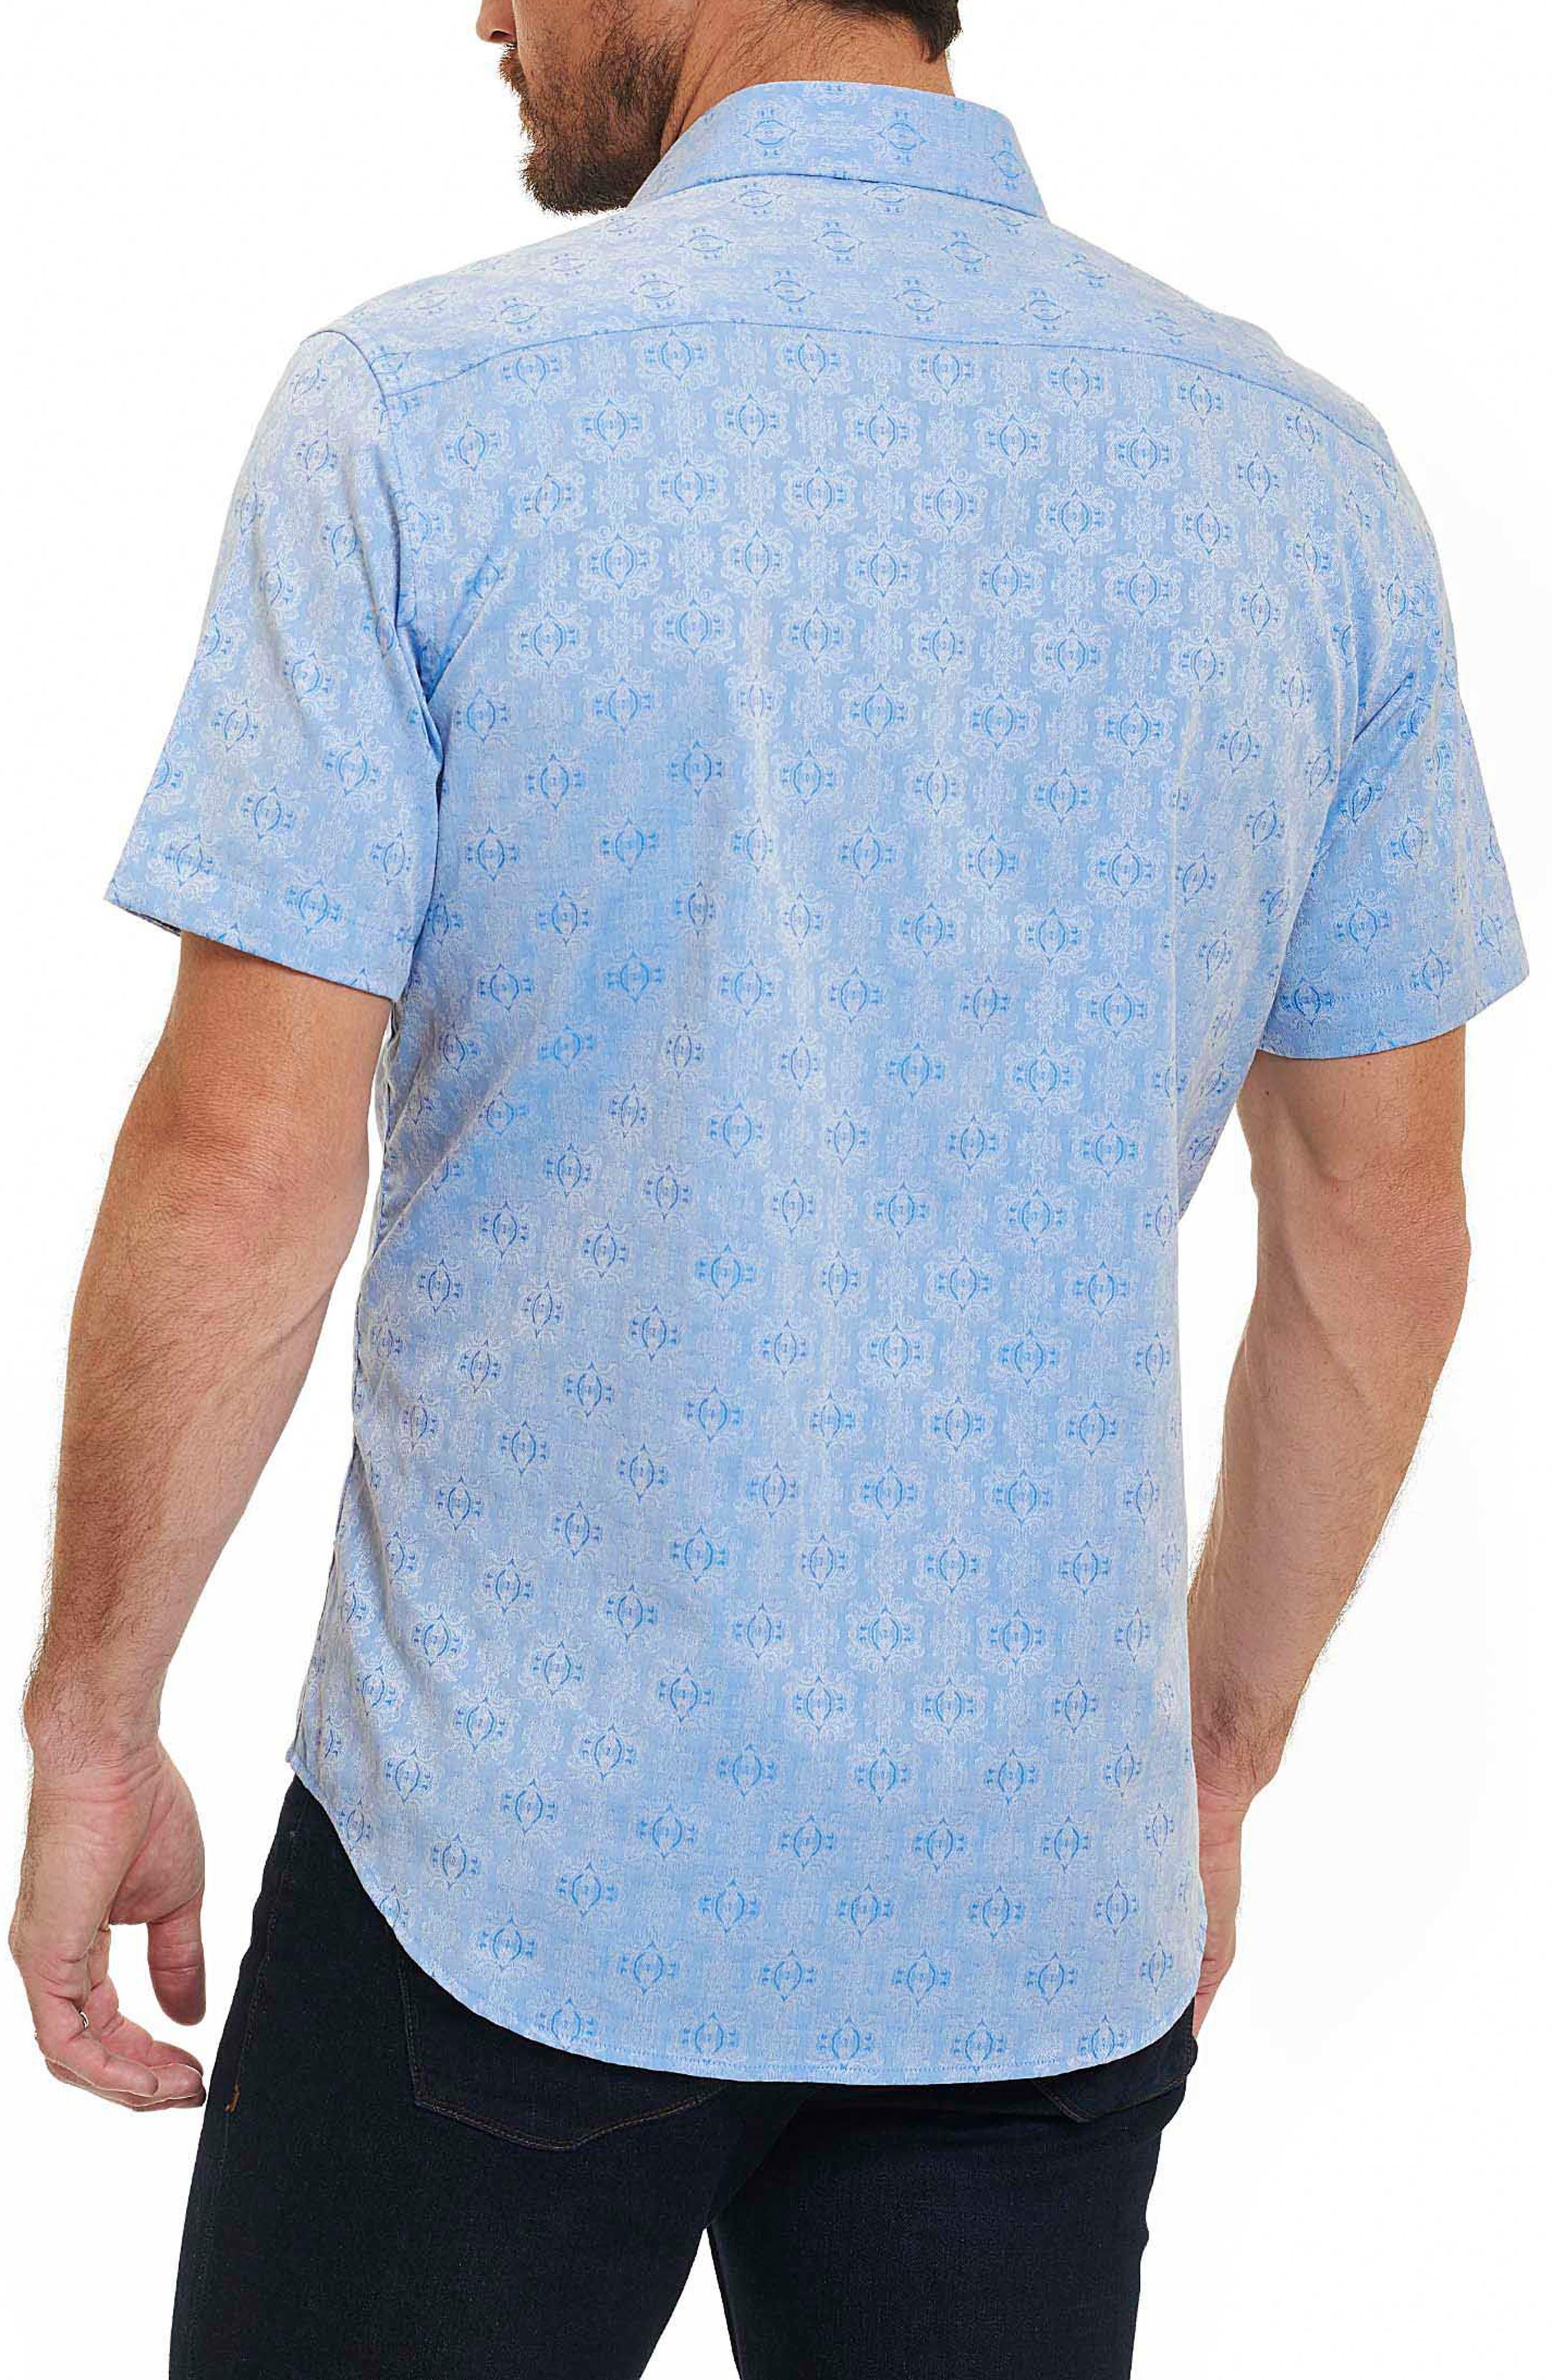 Cullen Regular Fit Sport Shirt,                             Alternate thumbnail 12, color,